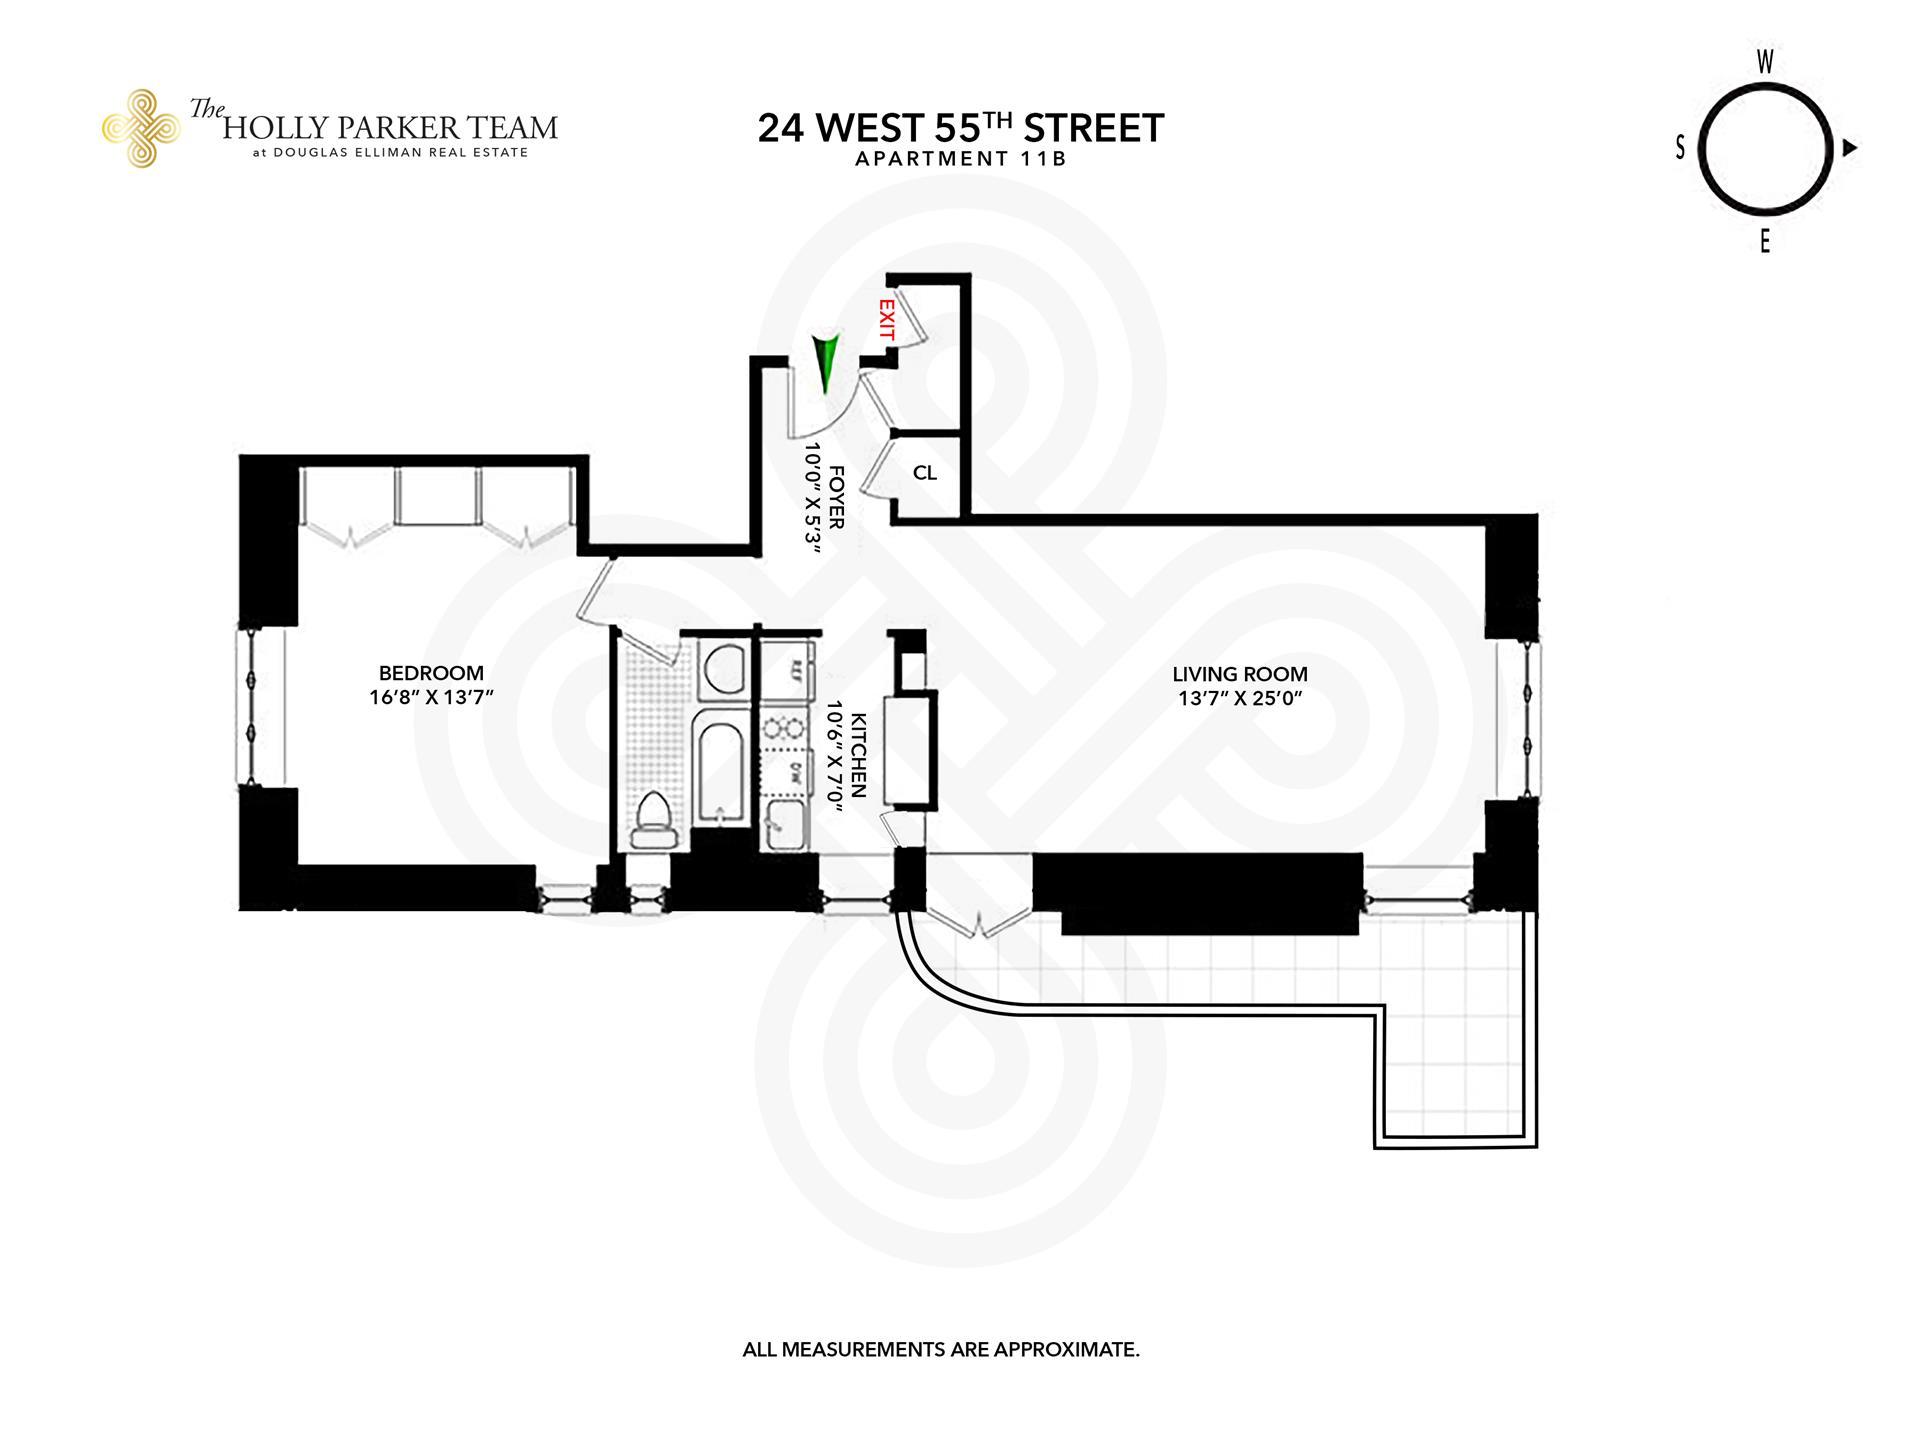 Floor plan of The Rockefeller Apartments, 24 West 55th St, 11B - Midtown, New York